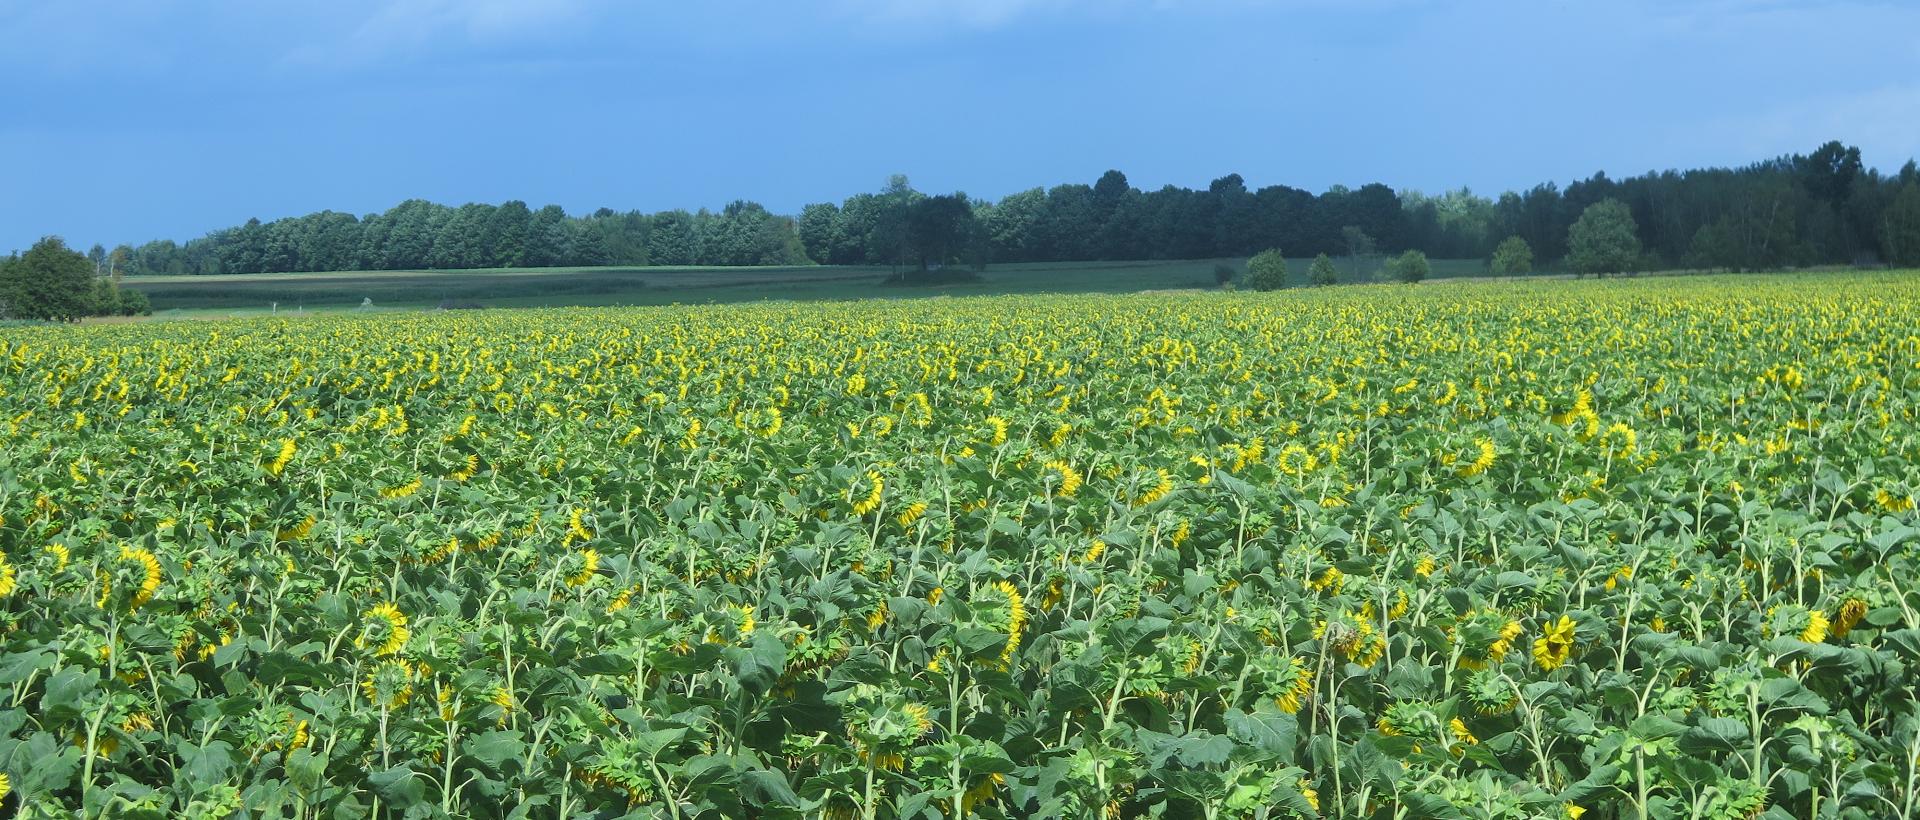 Champ de tournesol - Sunflower Field